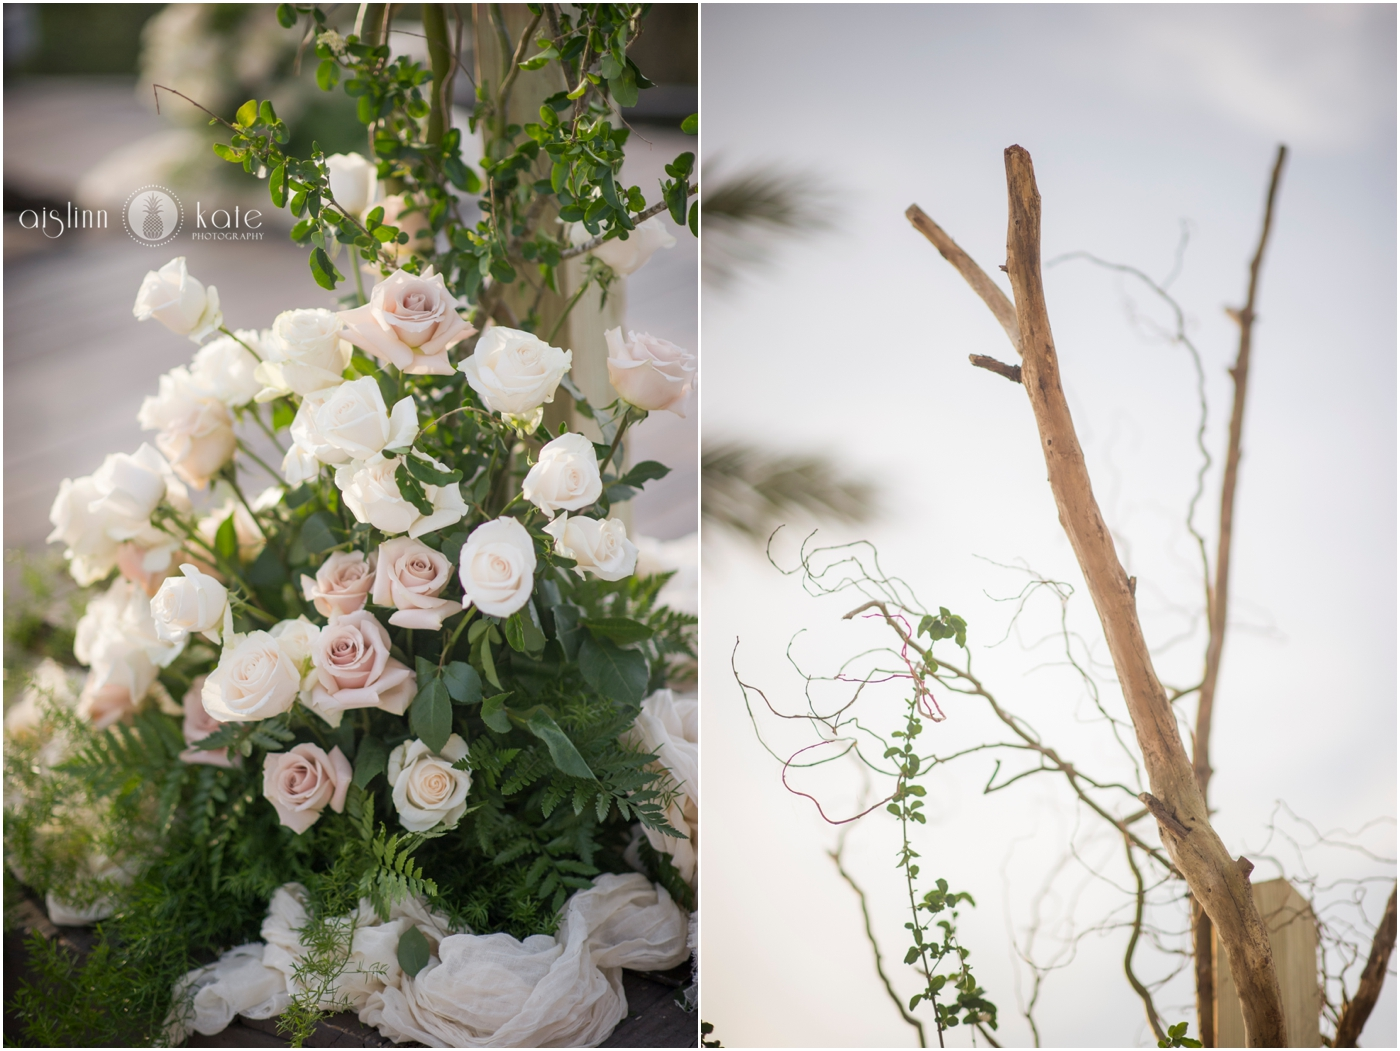 Pensacola-Destin-Wedding-Photographer_6110.jpg